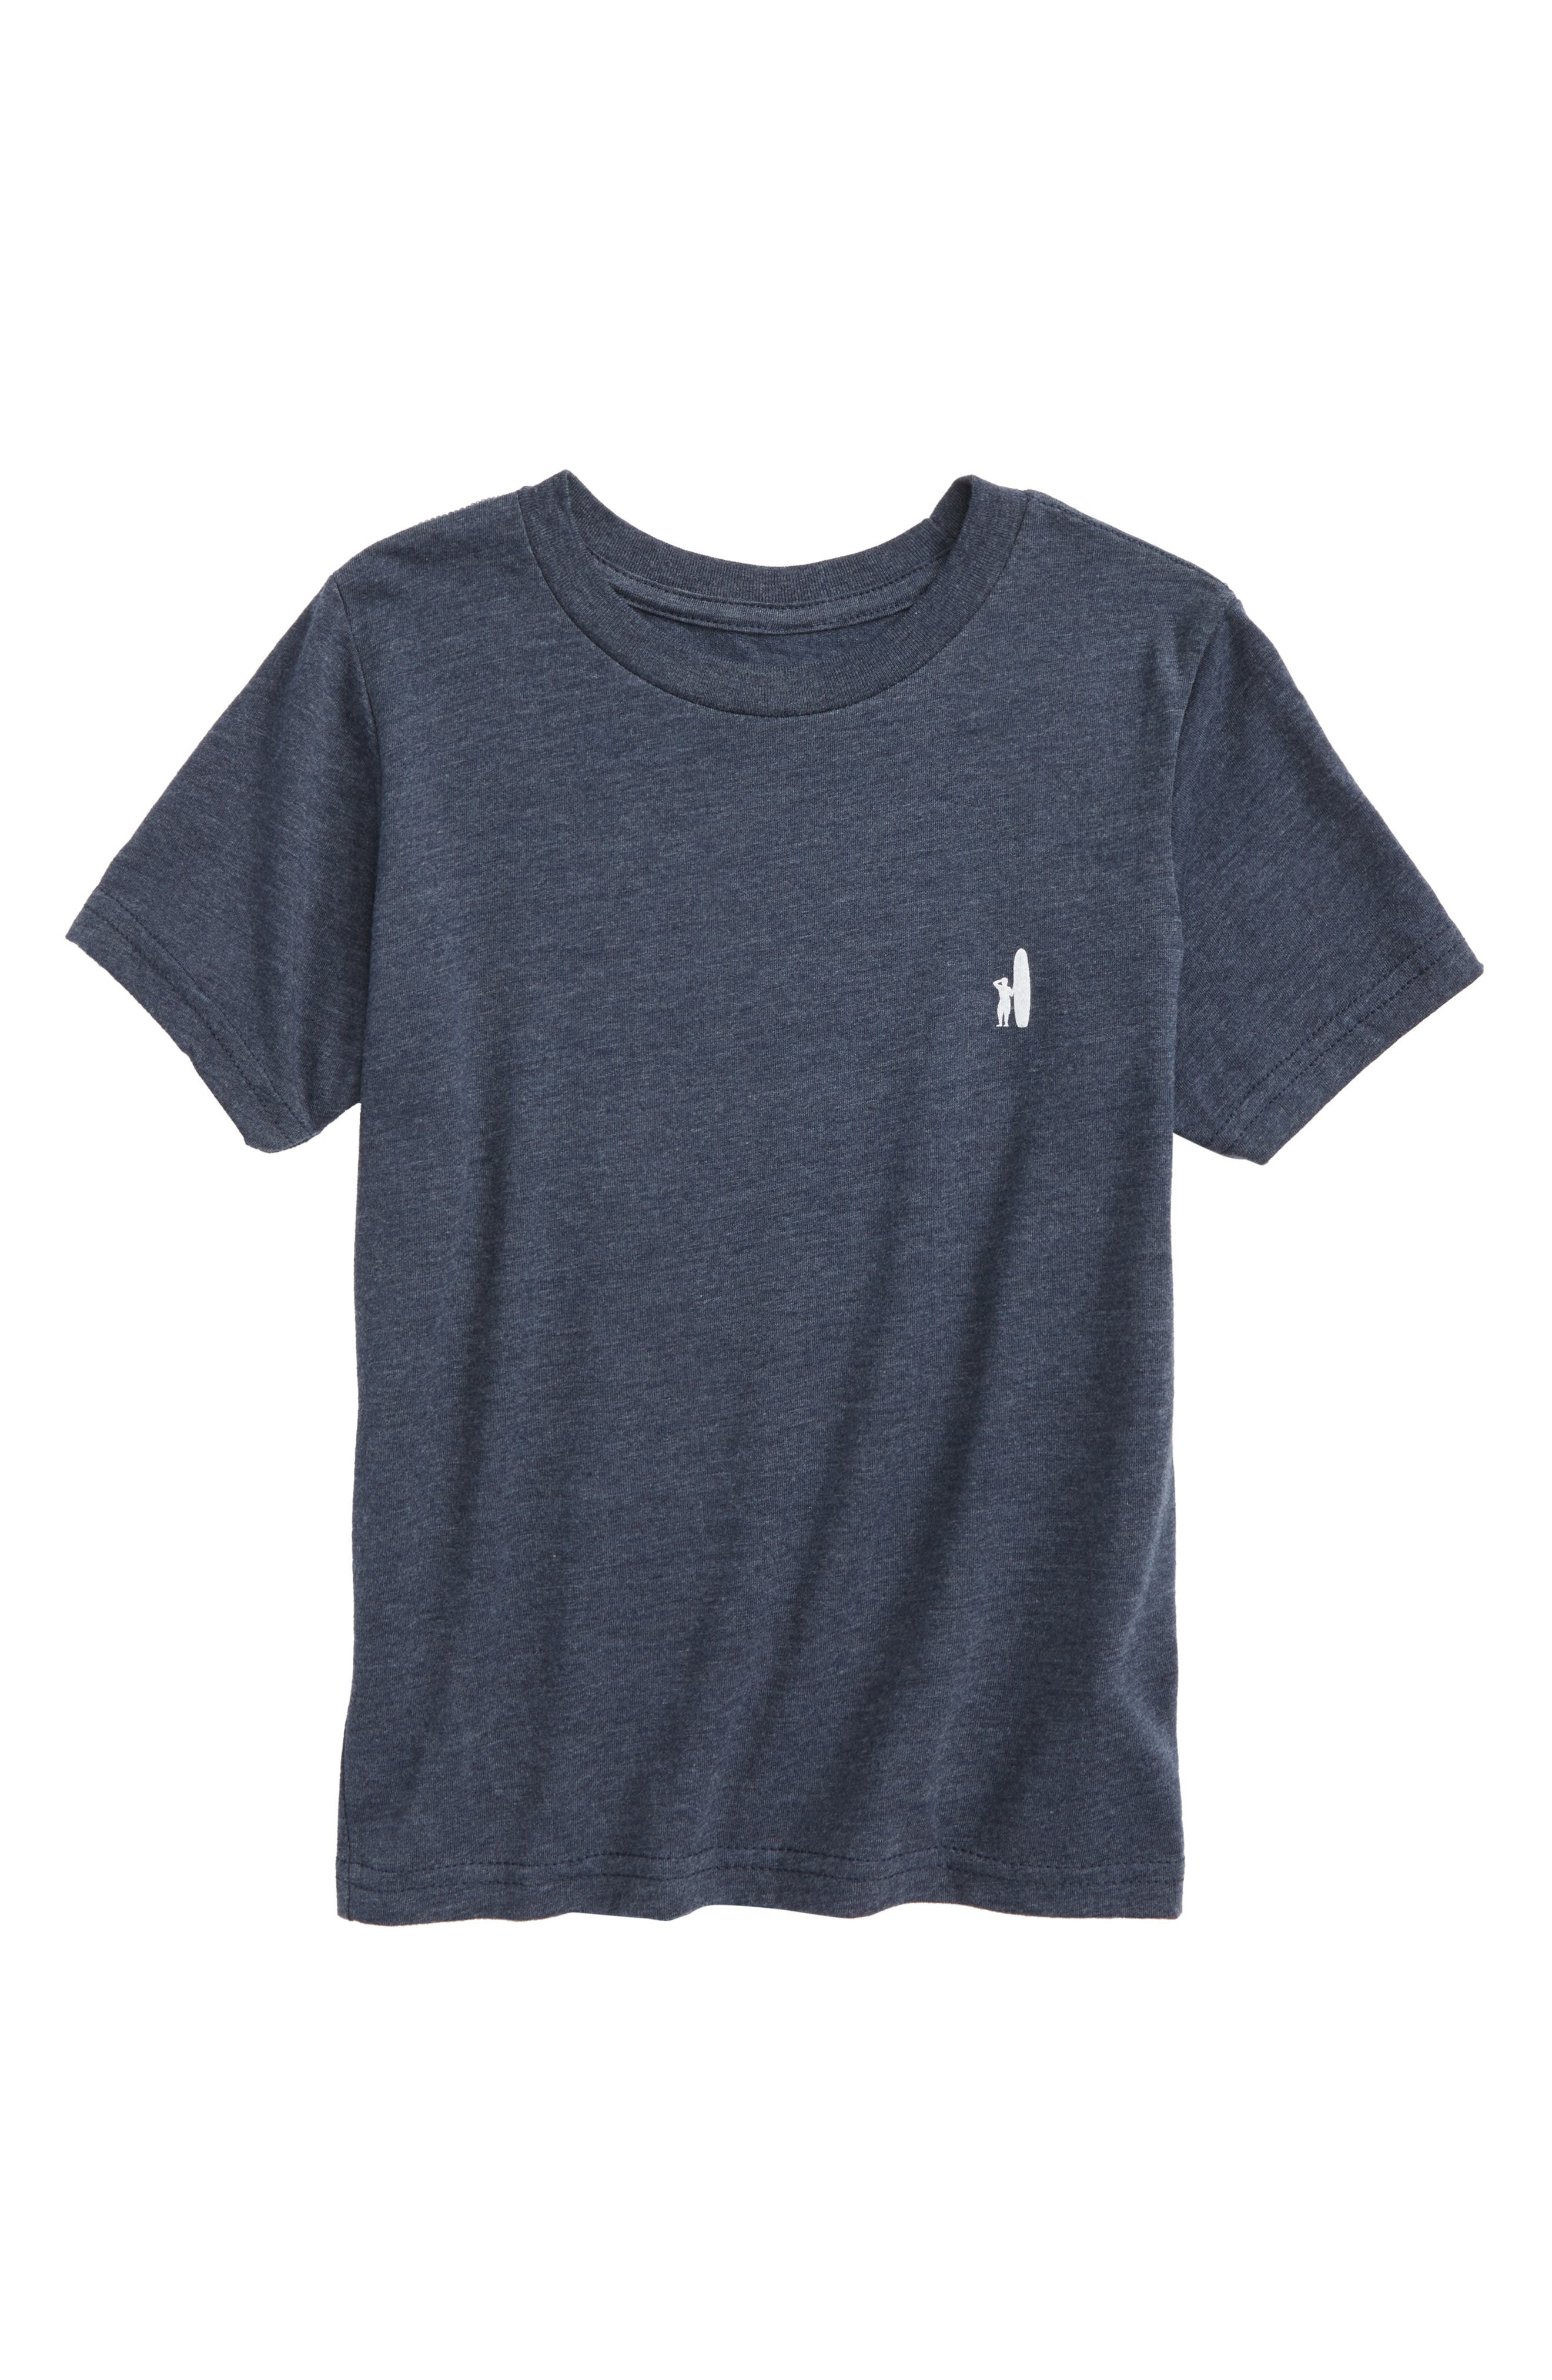 Bear Graphic T-Shirt,                             Main thumbnail 1, color,                             Twilight